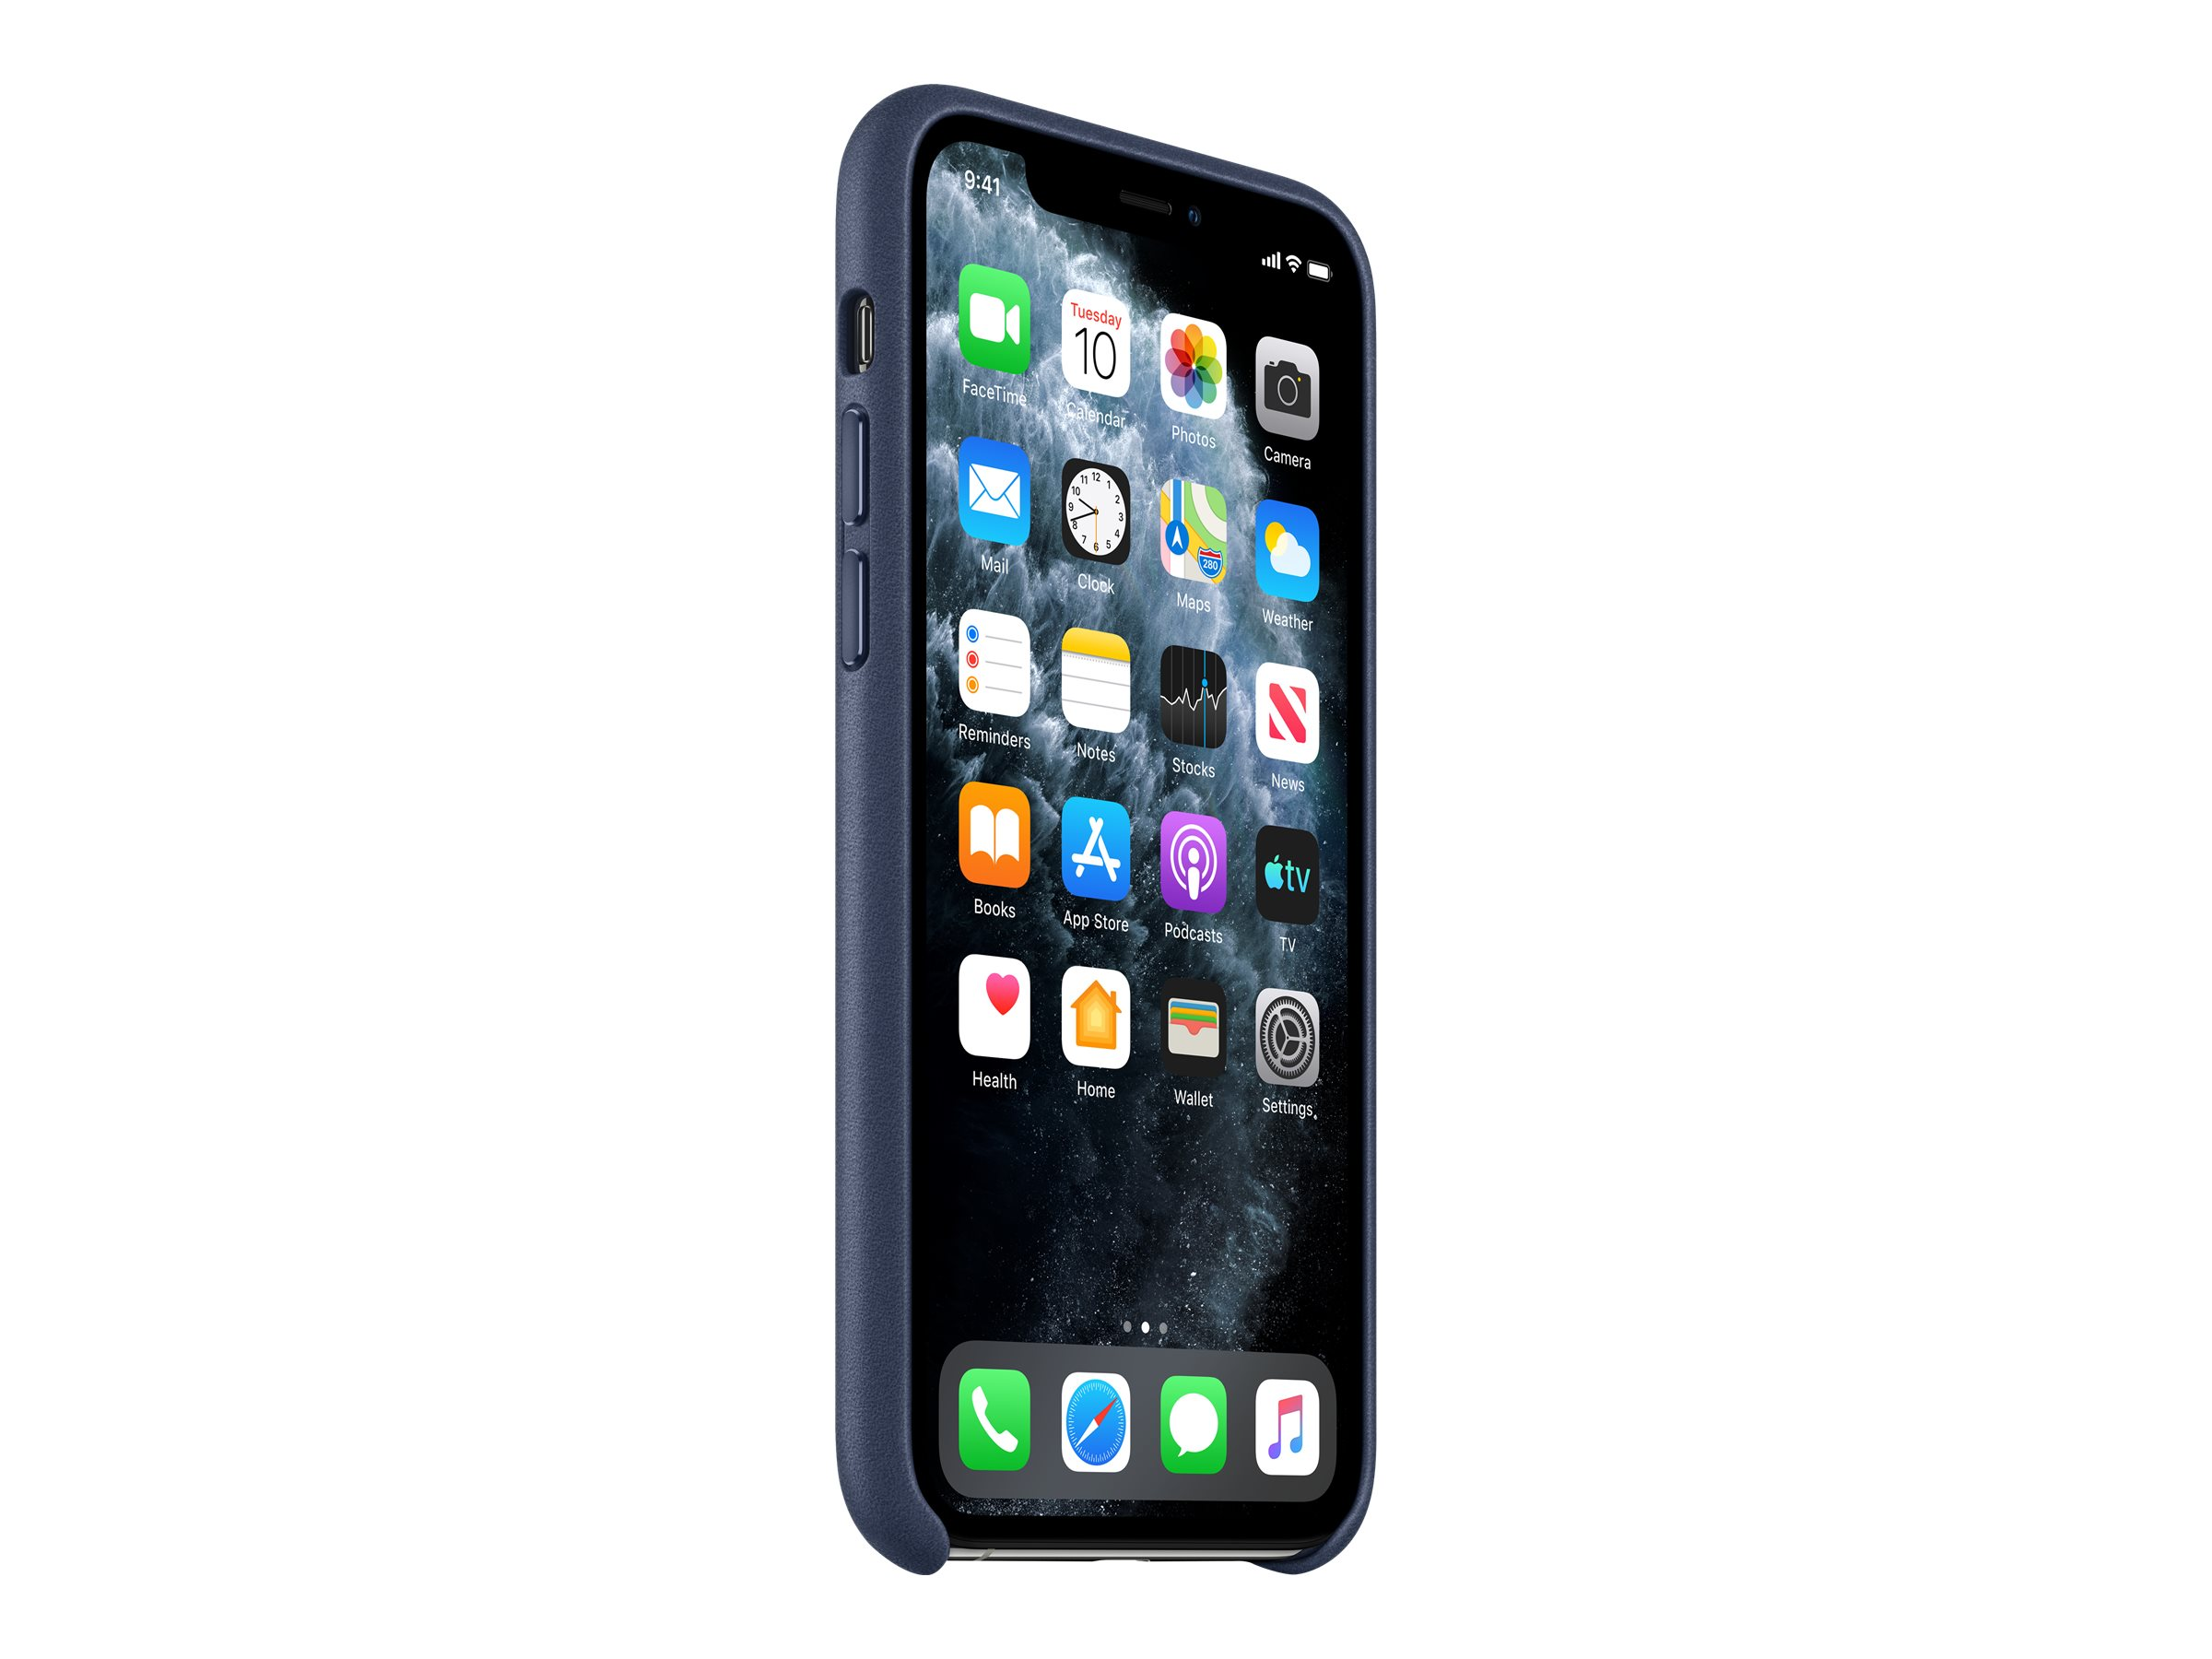 Hintere abdeckung fuer mobiltelefon leder mitternachtsblau fuer iphone 11 pro 11867115 mwyg2zm a